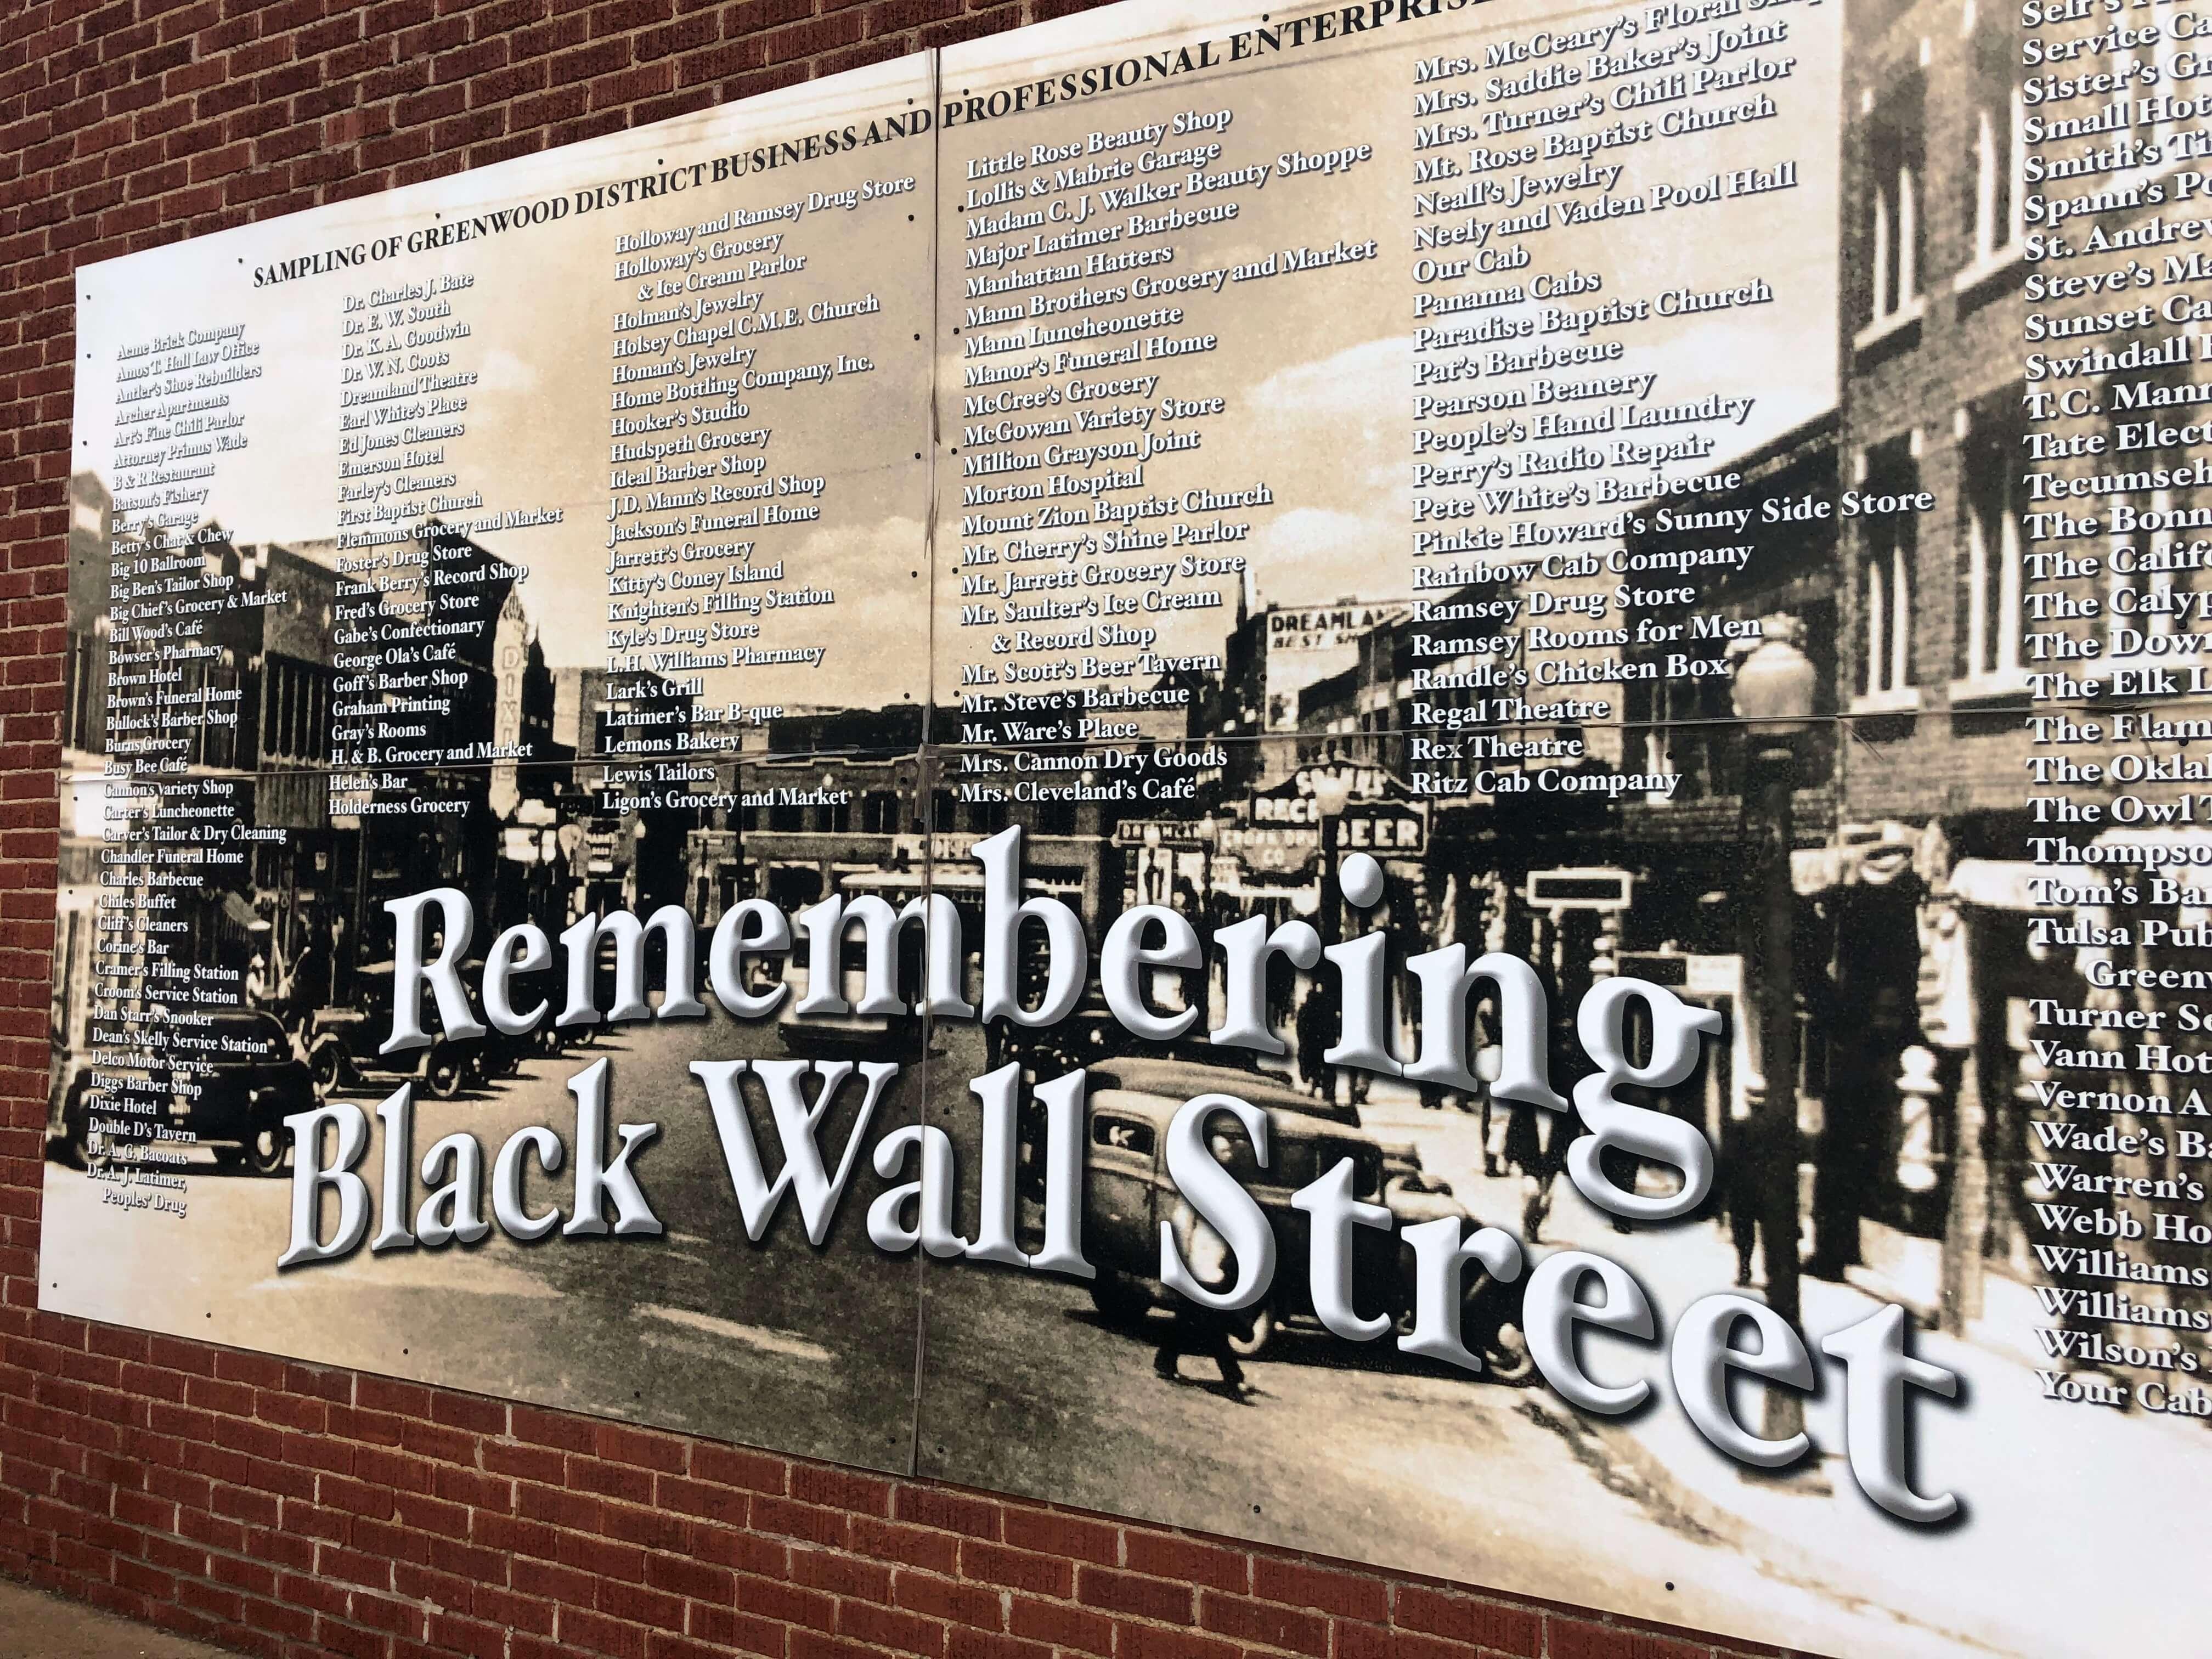 Black Wall Street Tulsa, Oklahoma